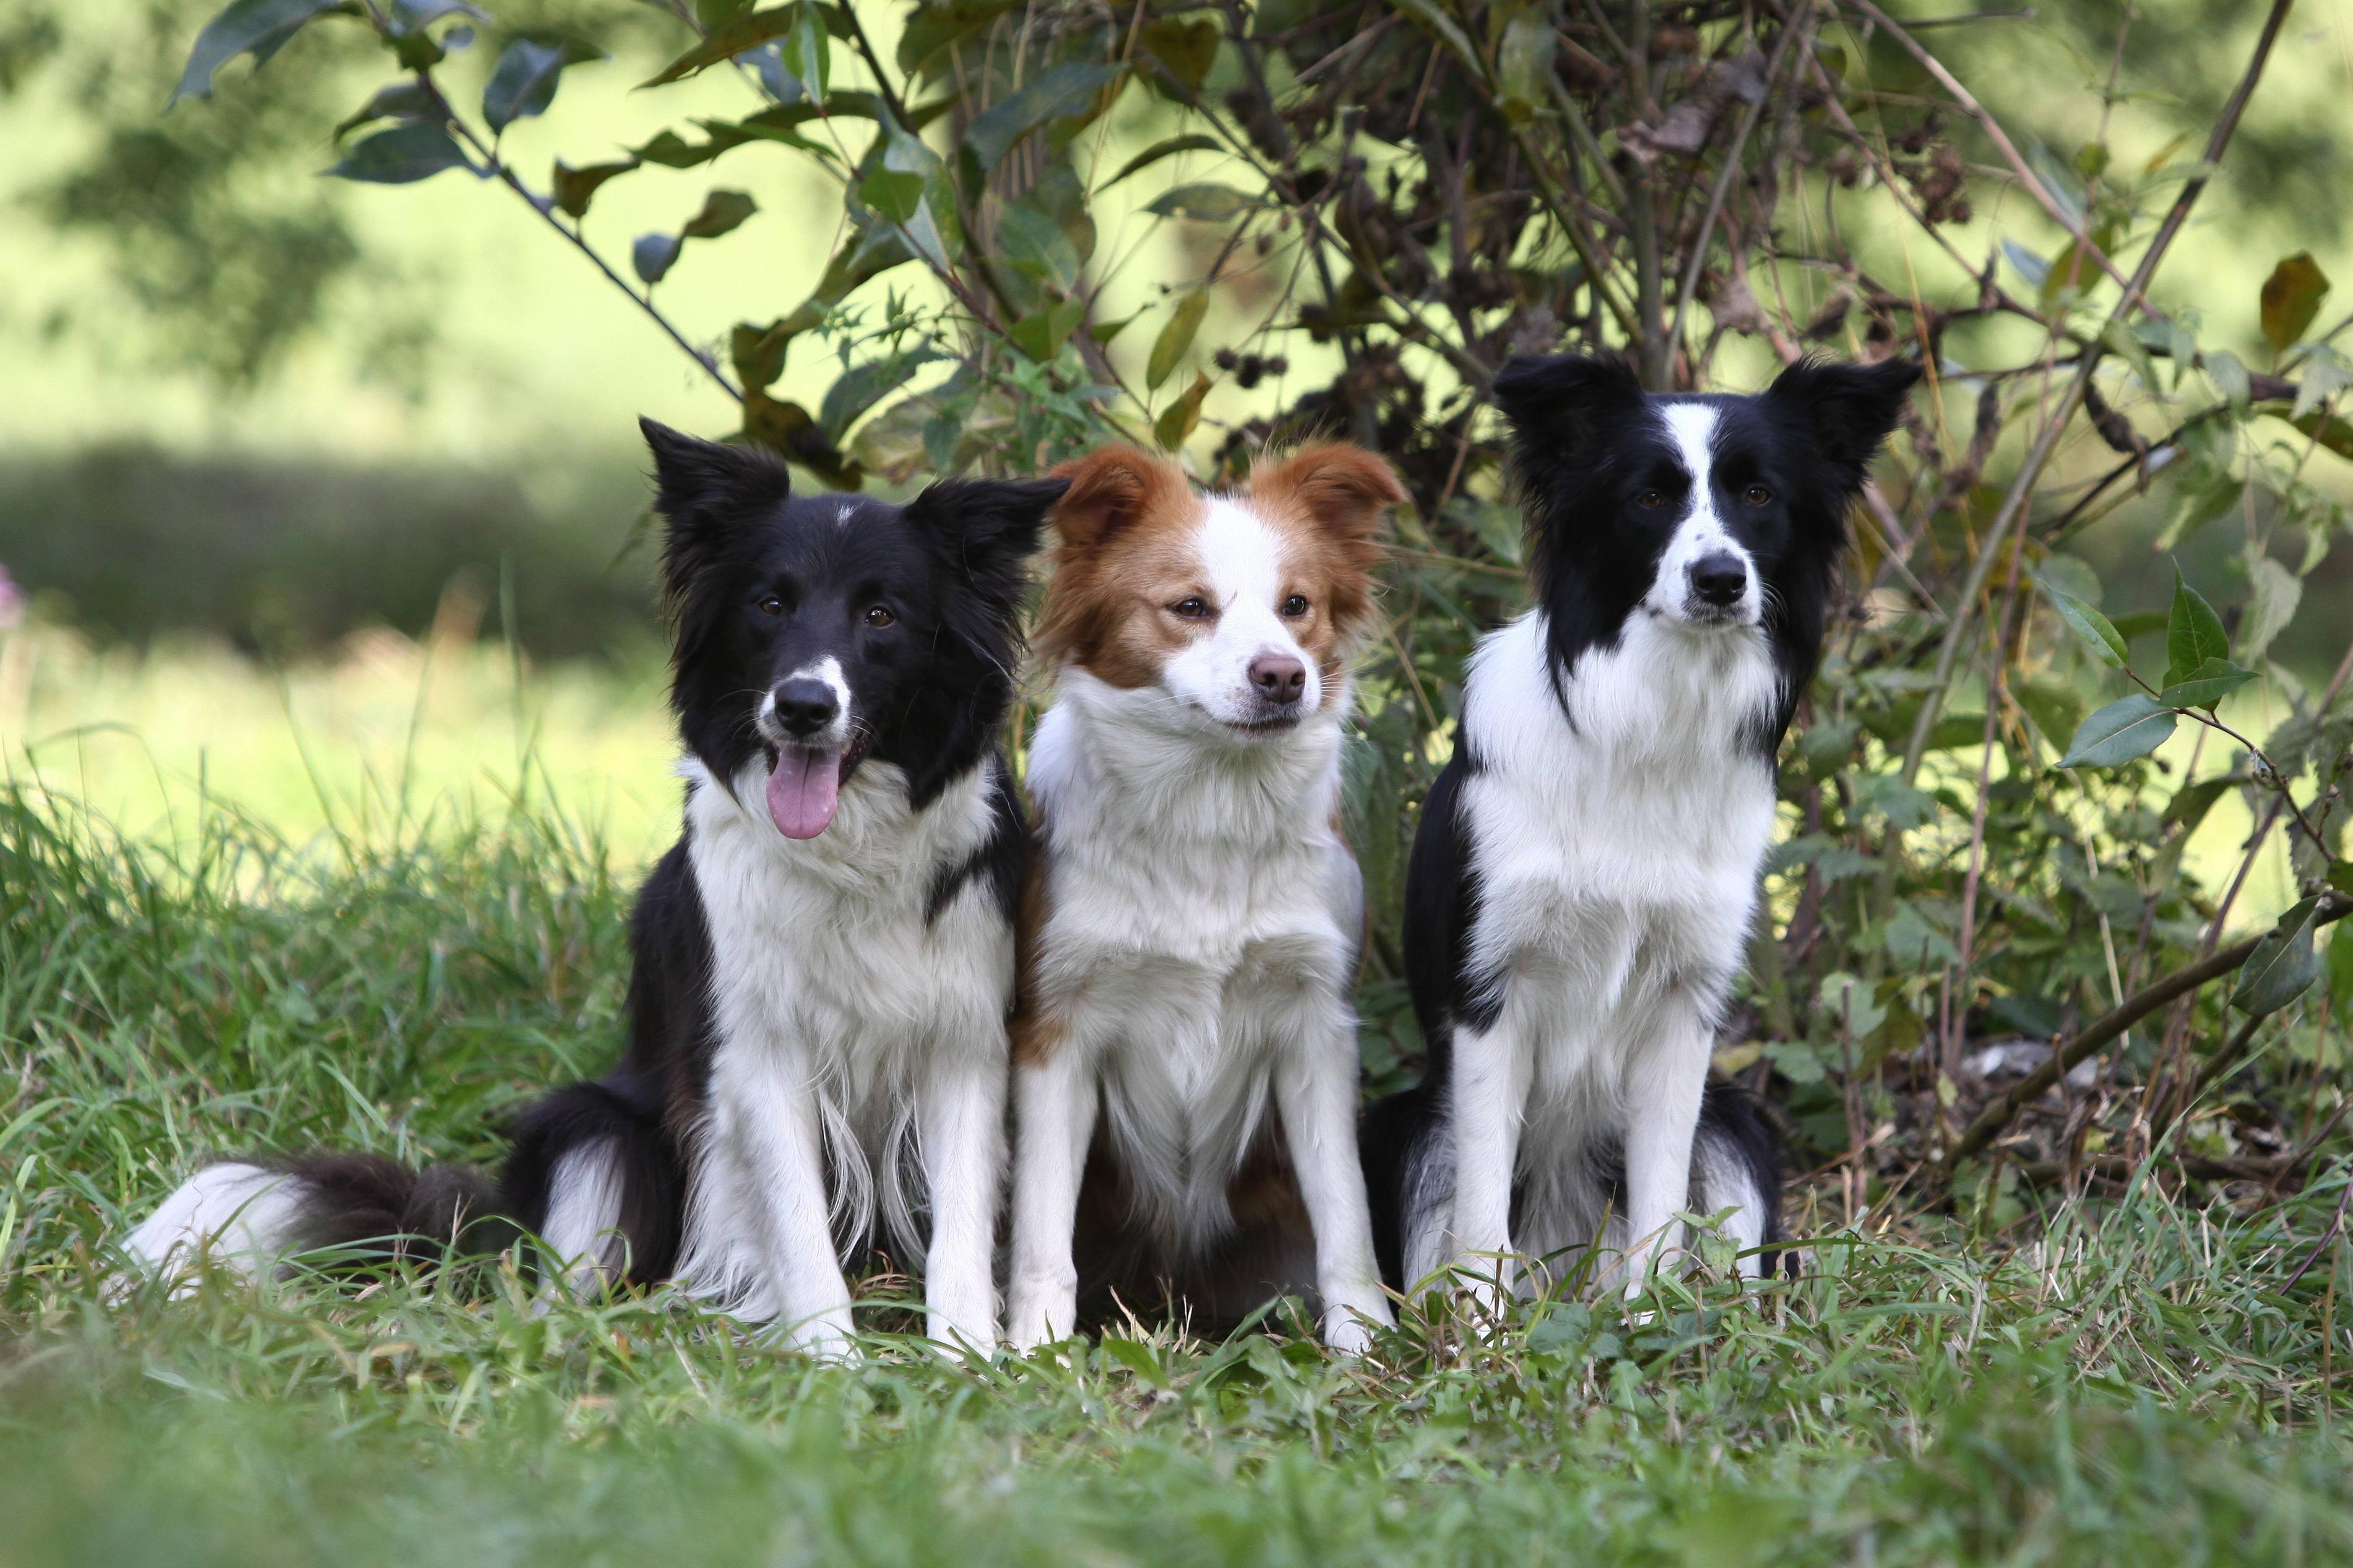 border collie wallpapers wallpaper cavedownload wallpaper dog, puppy, border collie free desktop